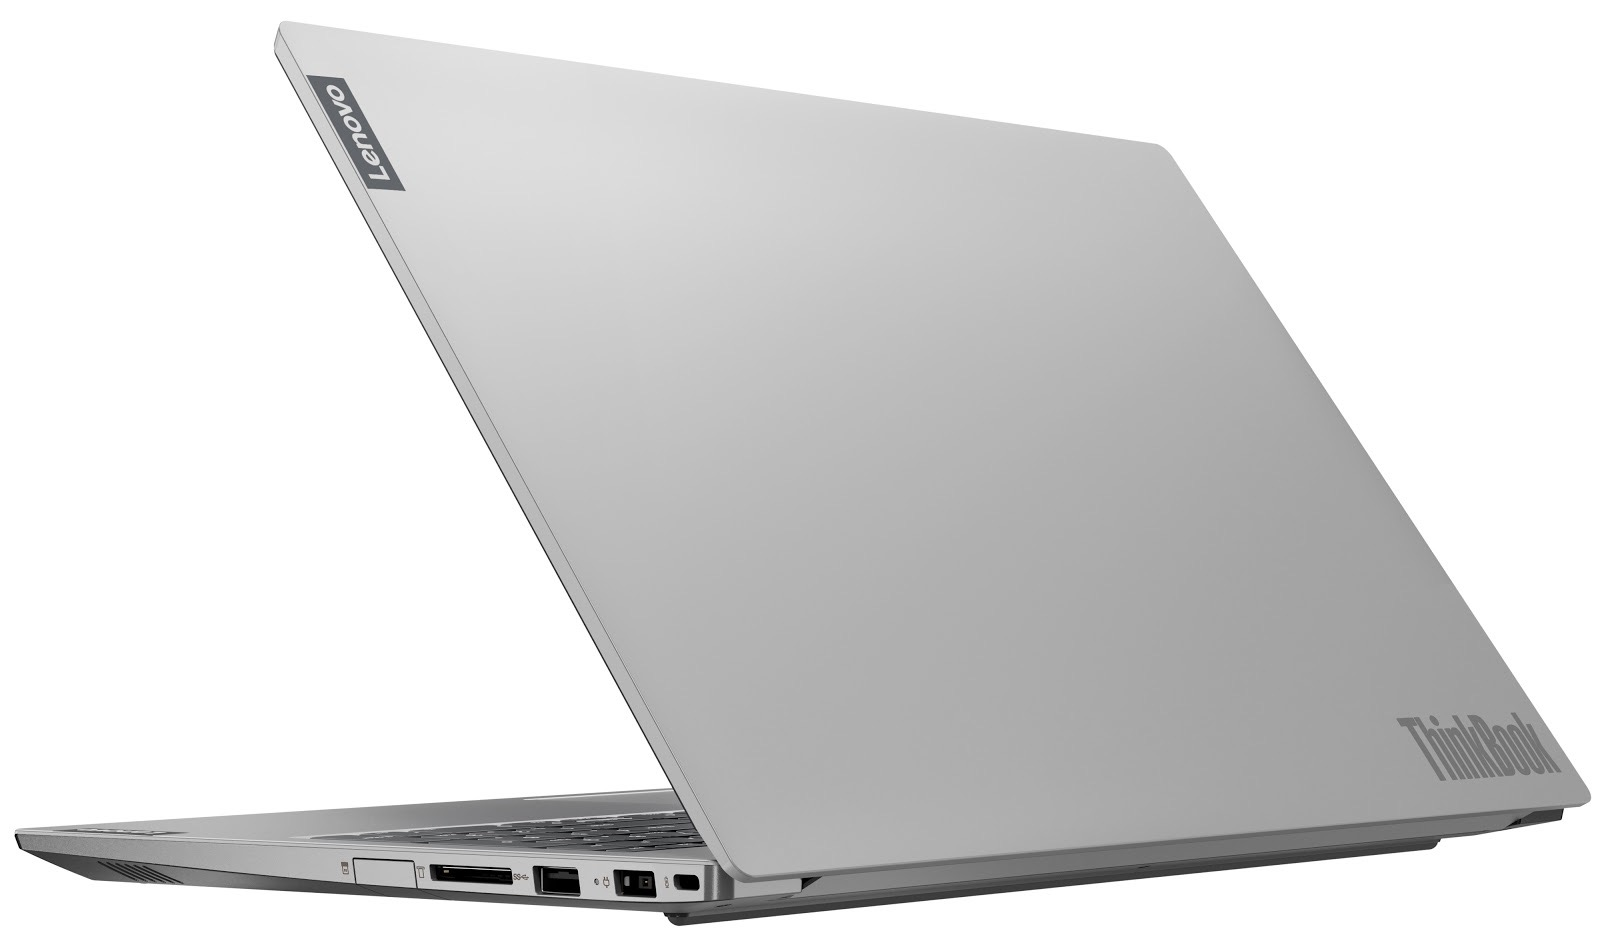 Фото 1. Ноутбук Lenovo ThinkBook 15-IIL (20SM007LRU)